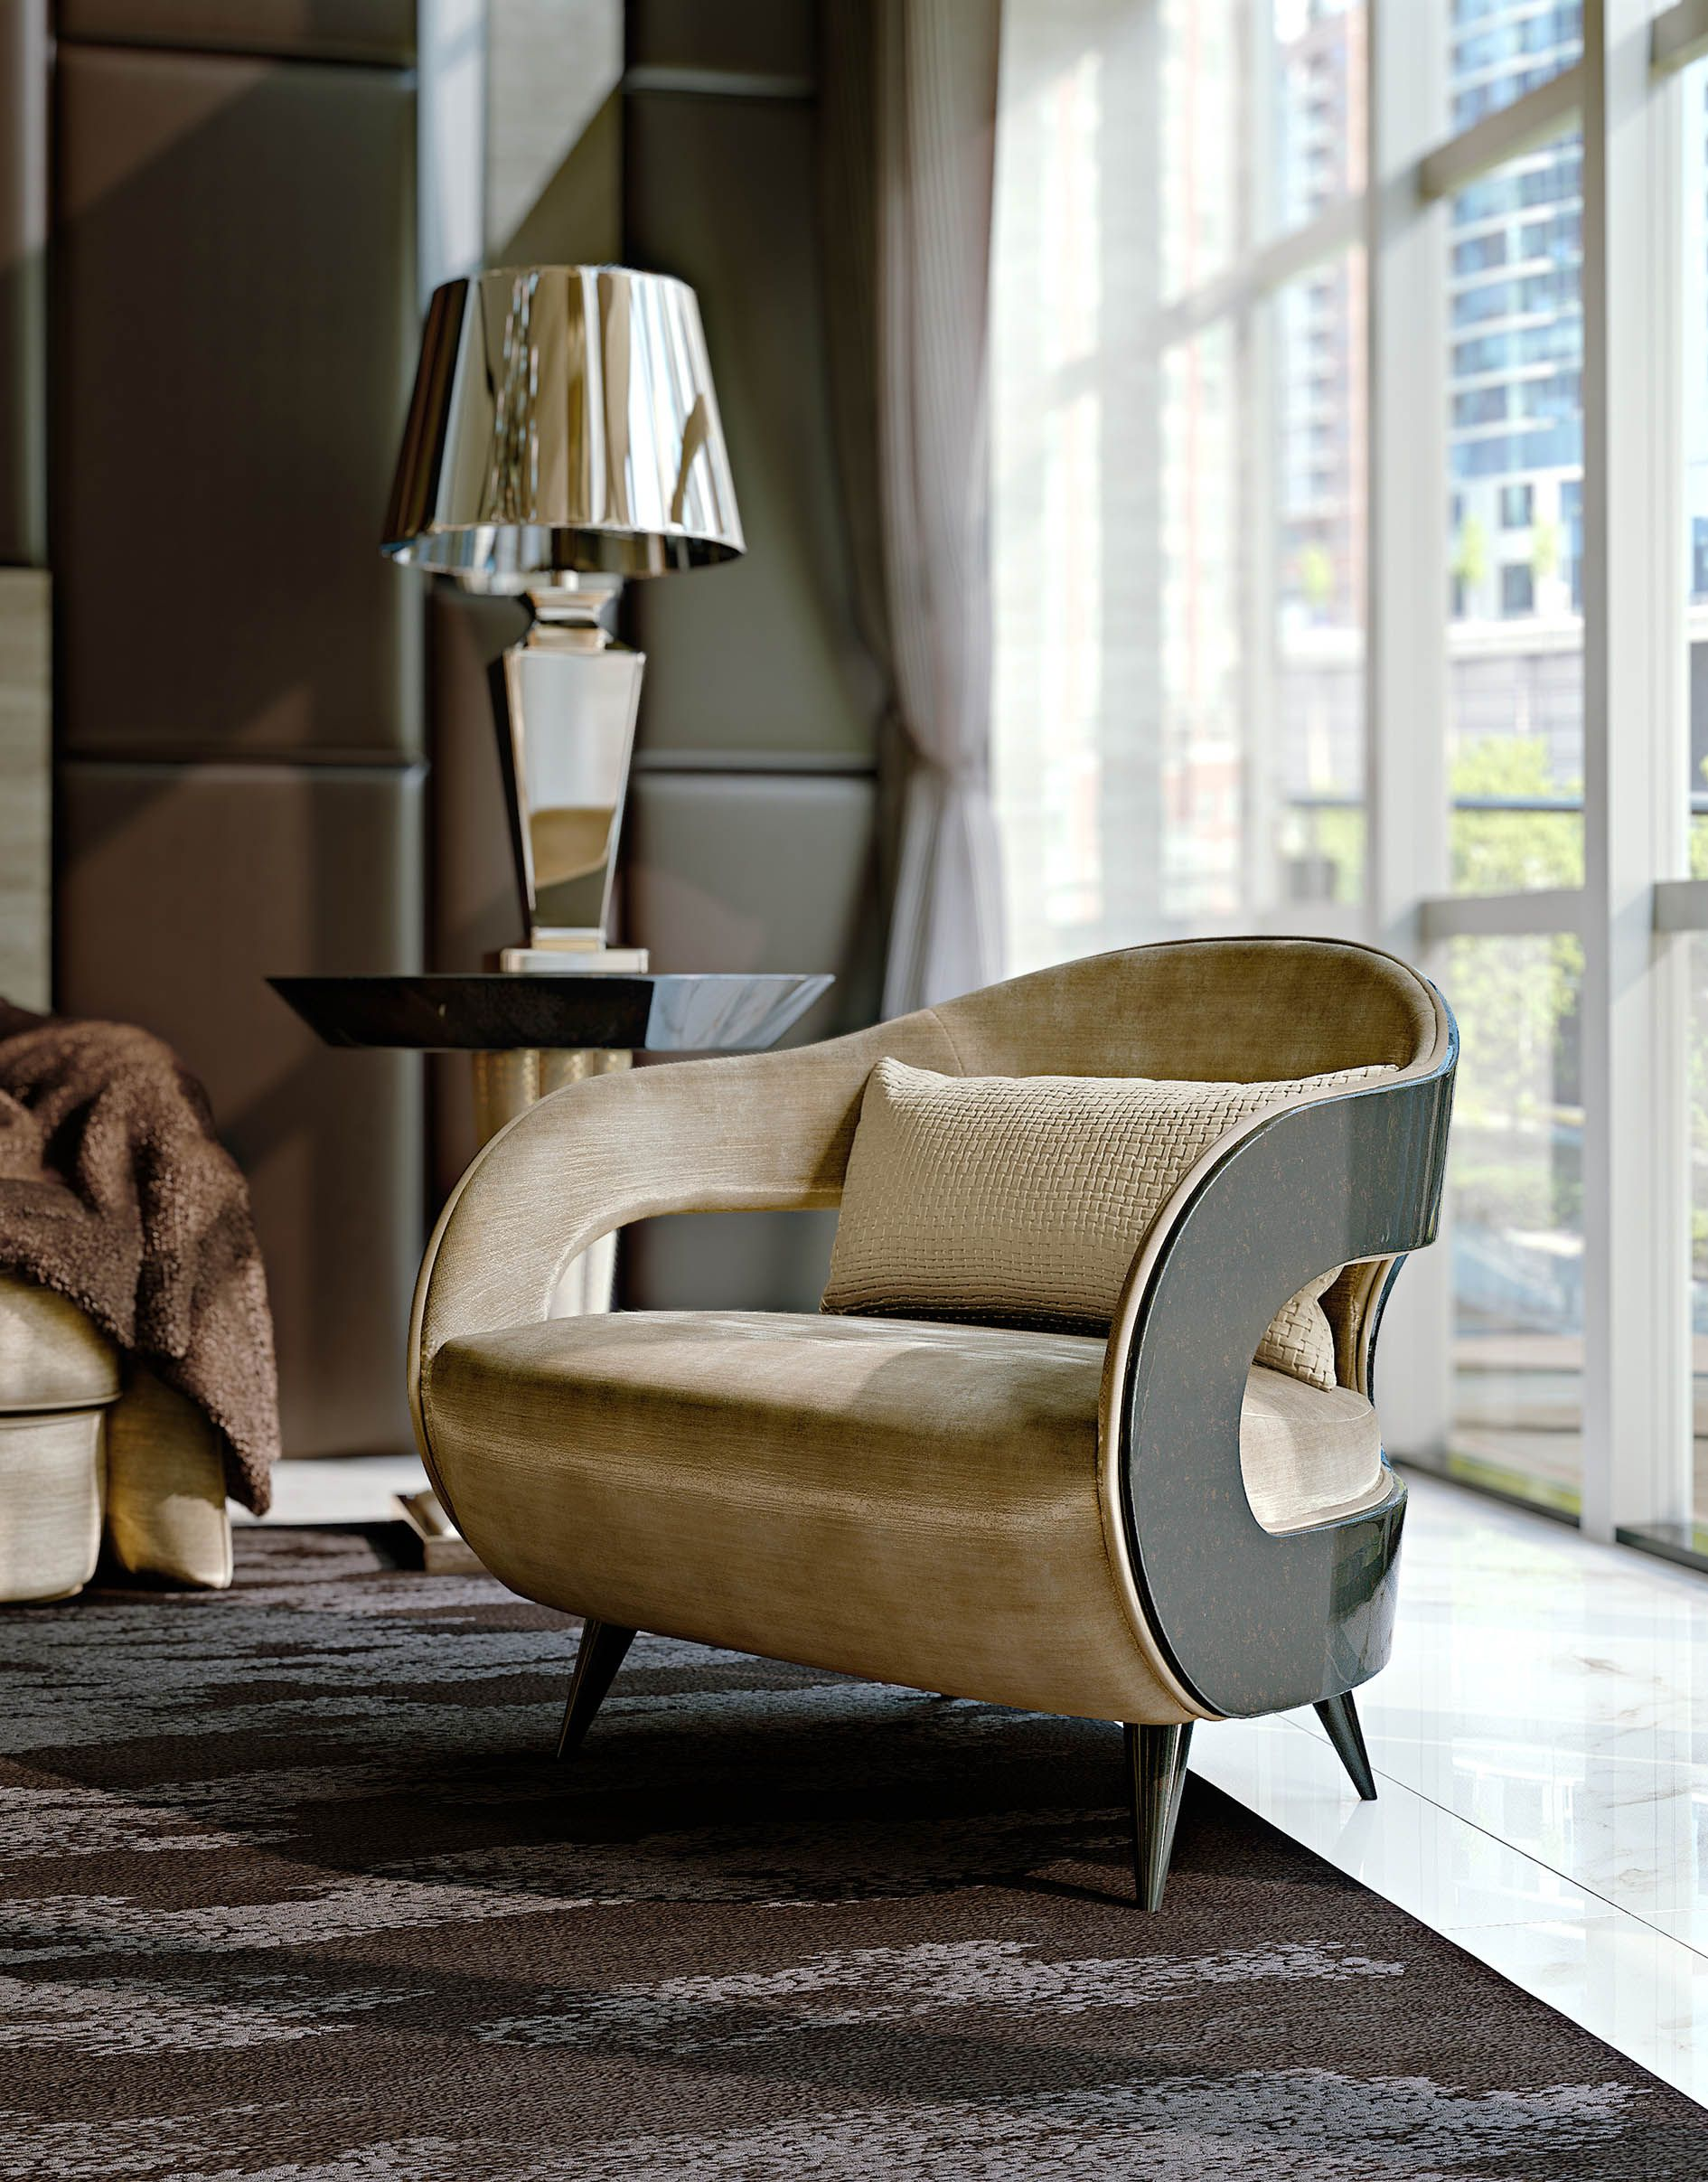 Stardust collection www turri it italian luxury design armchair deco furniture modern furniture